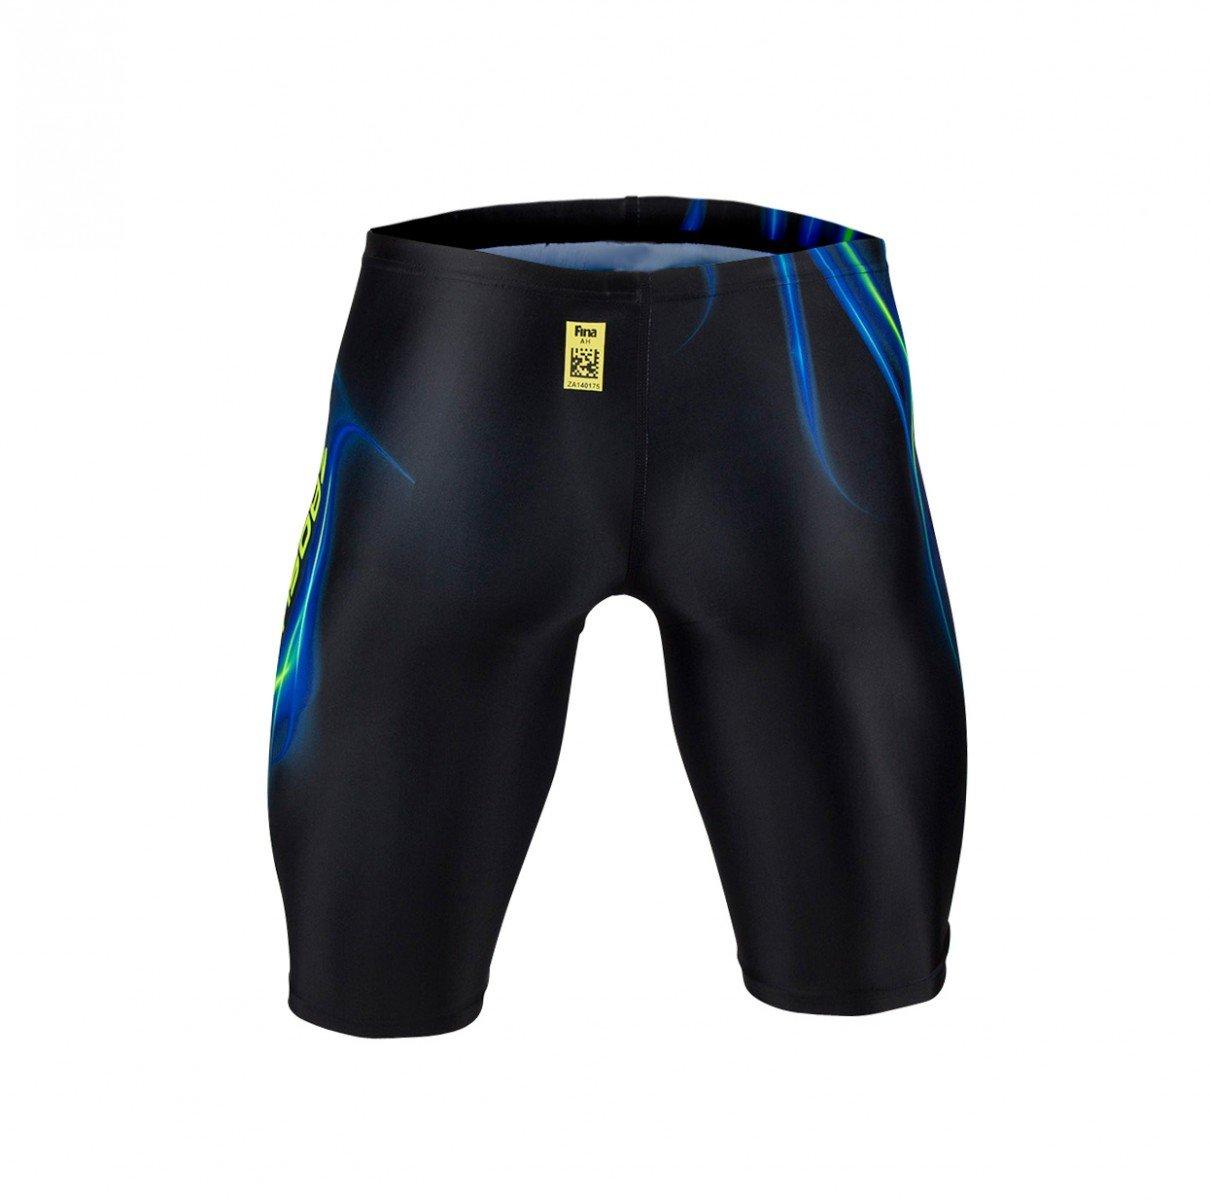 ZAOSU Z-Fire III Swim Jammer for Men and Boys Race Suit